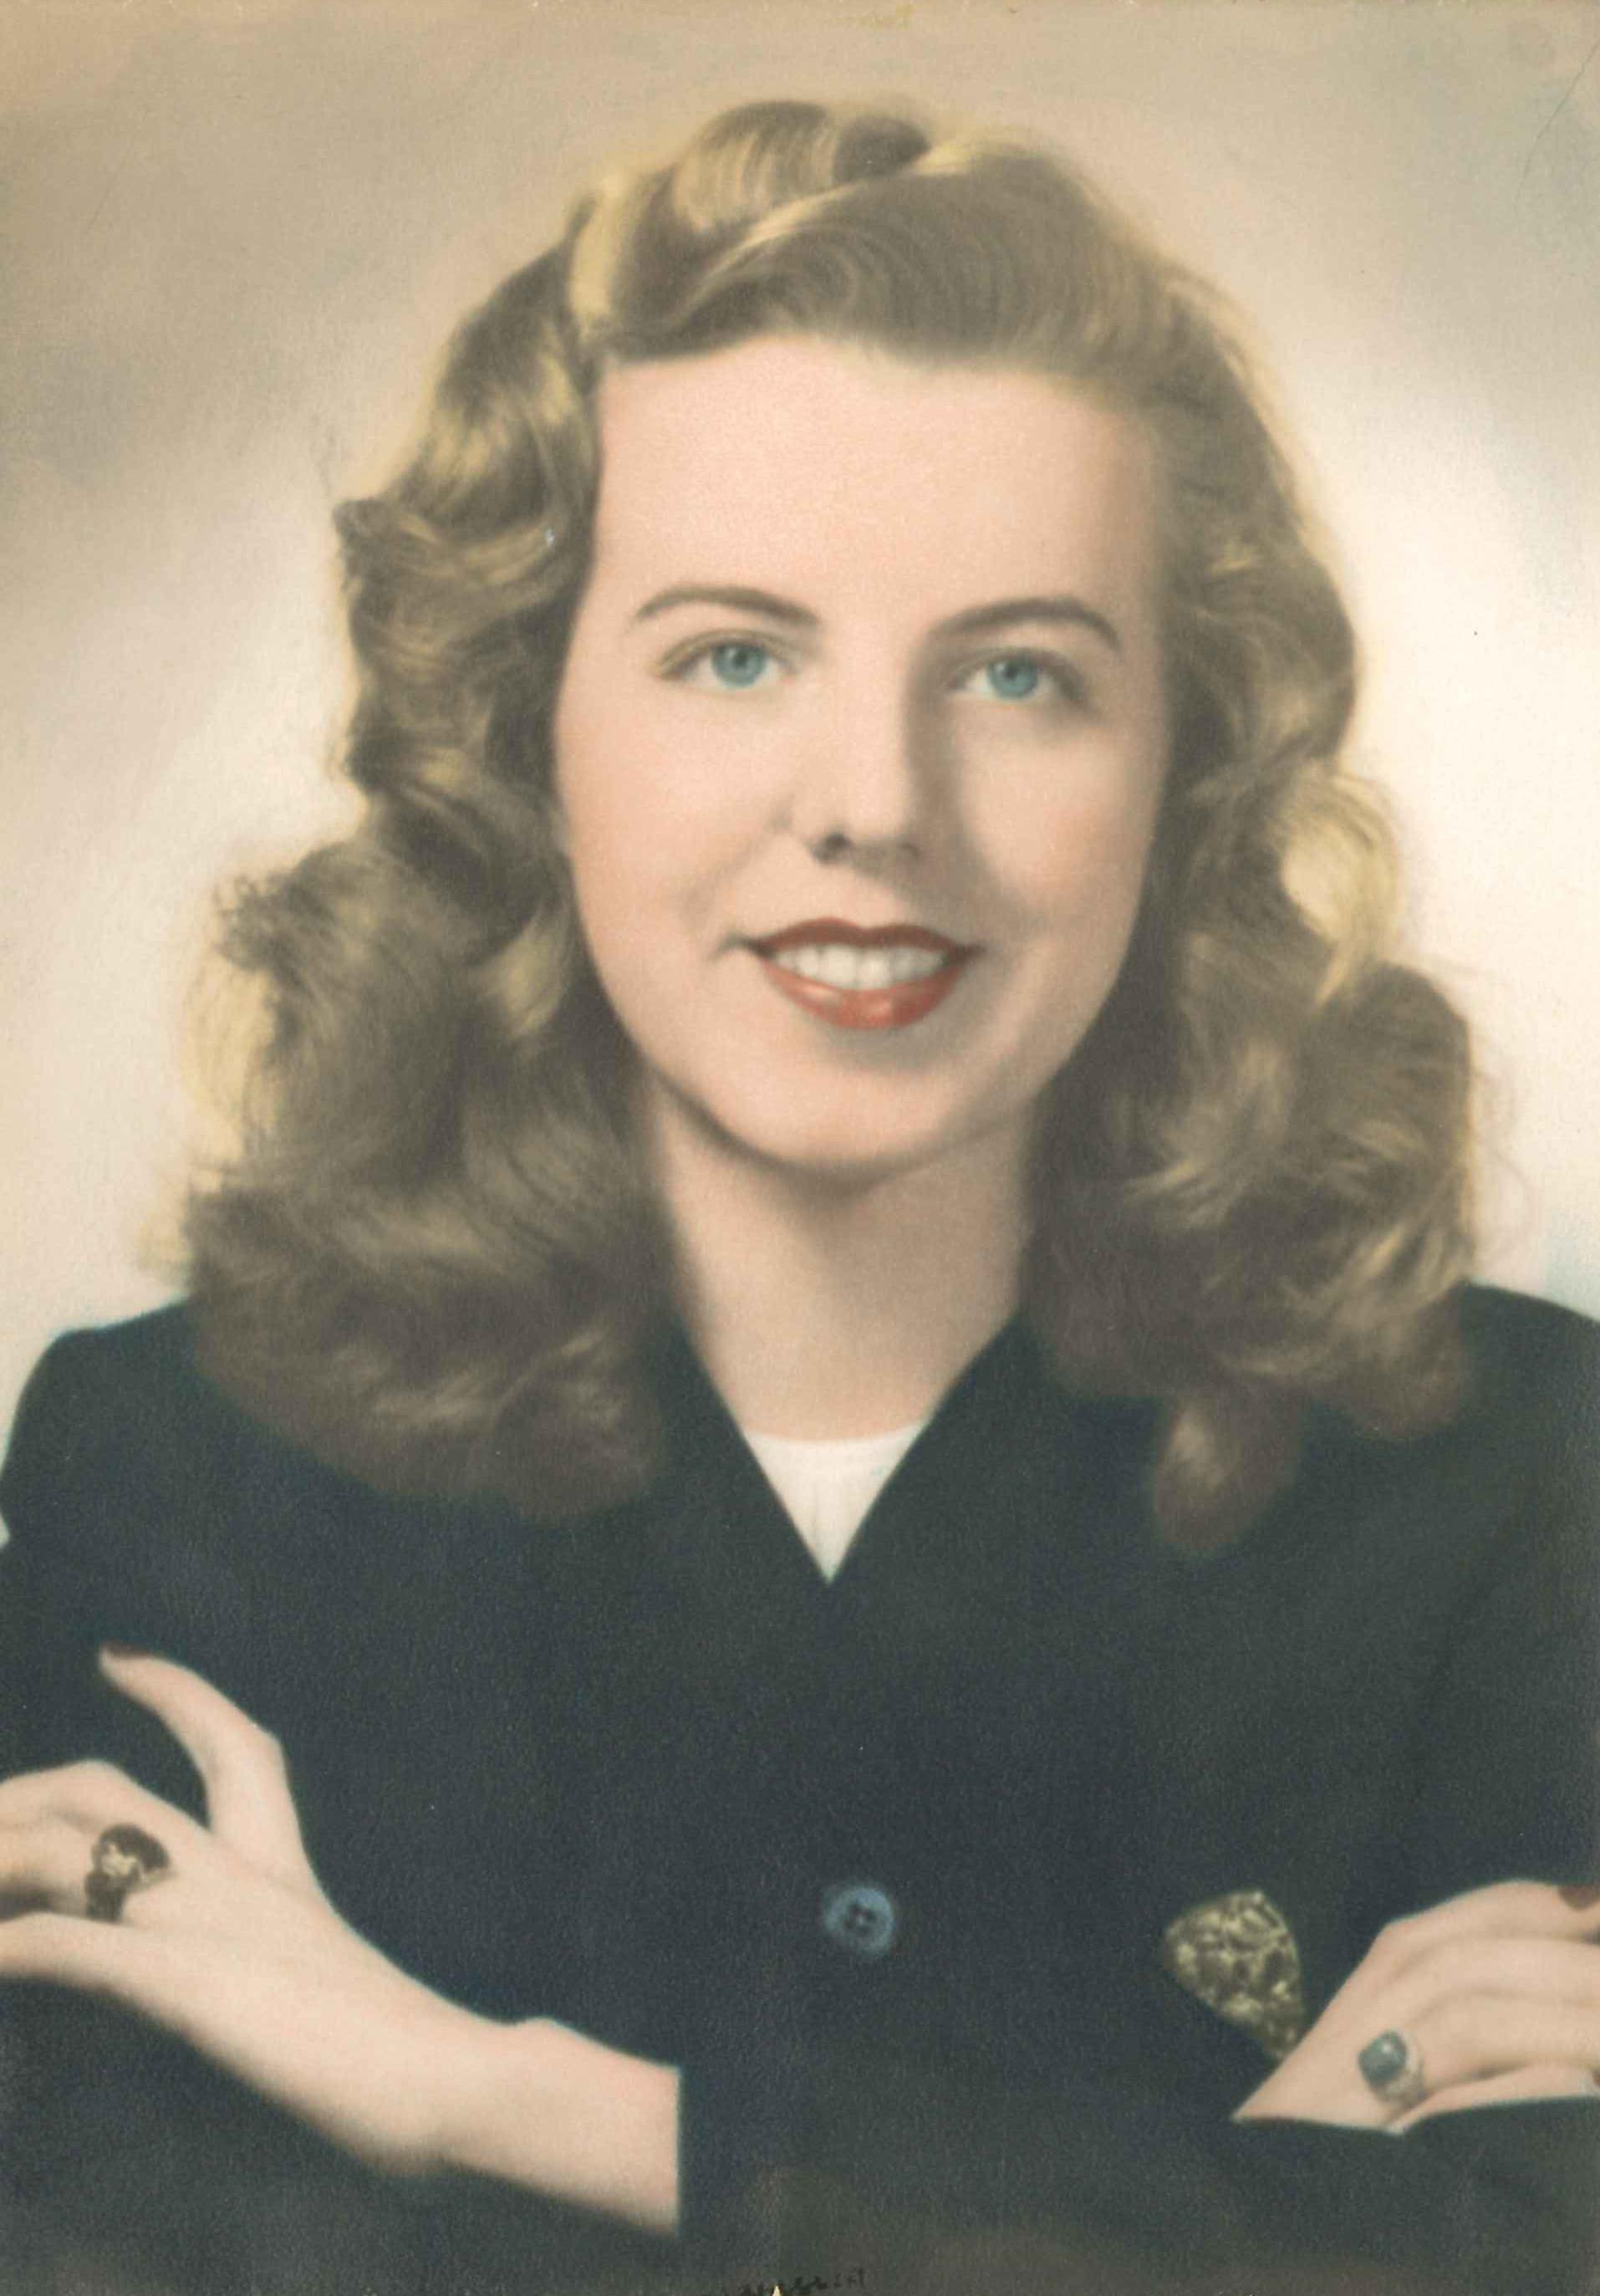 Densmer M. McIntyre, age 92 formerly of Lyons, Ne